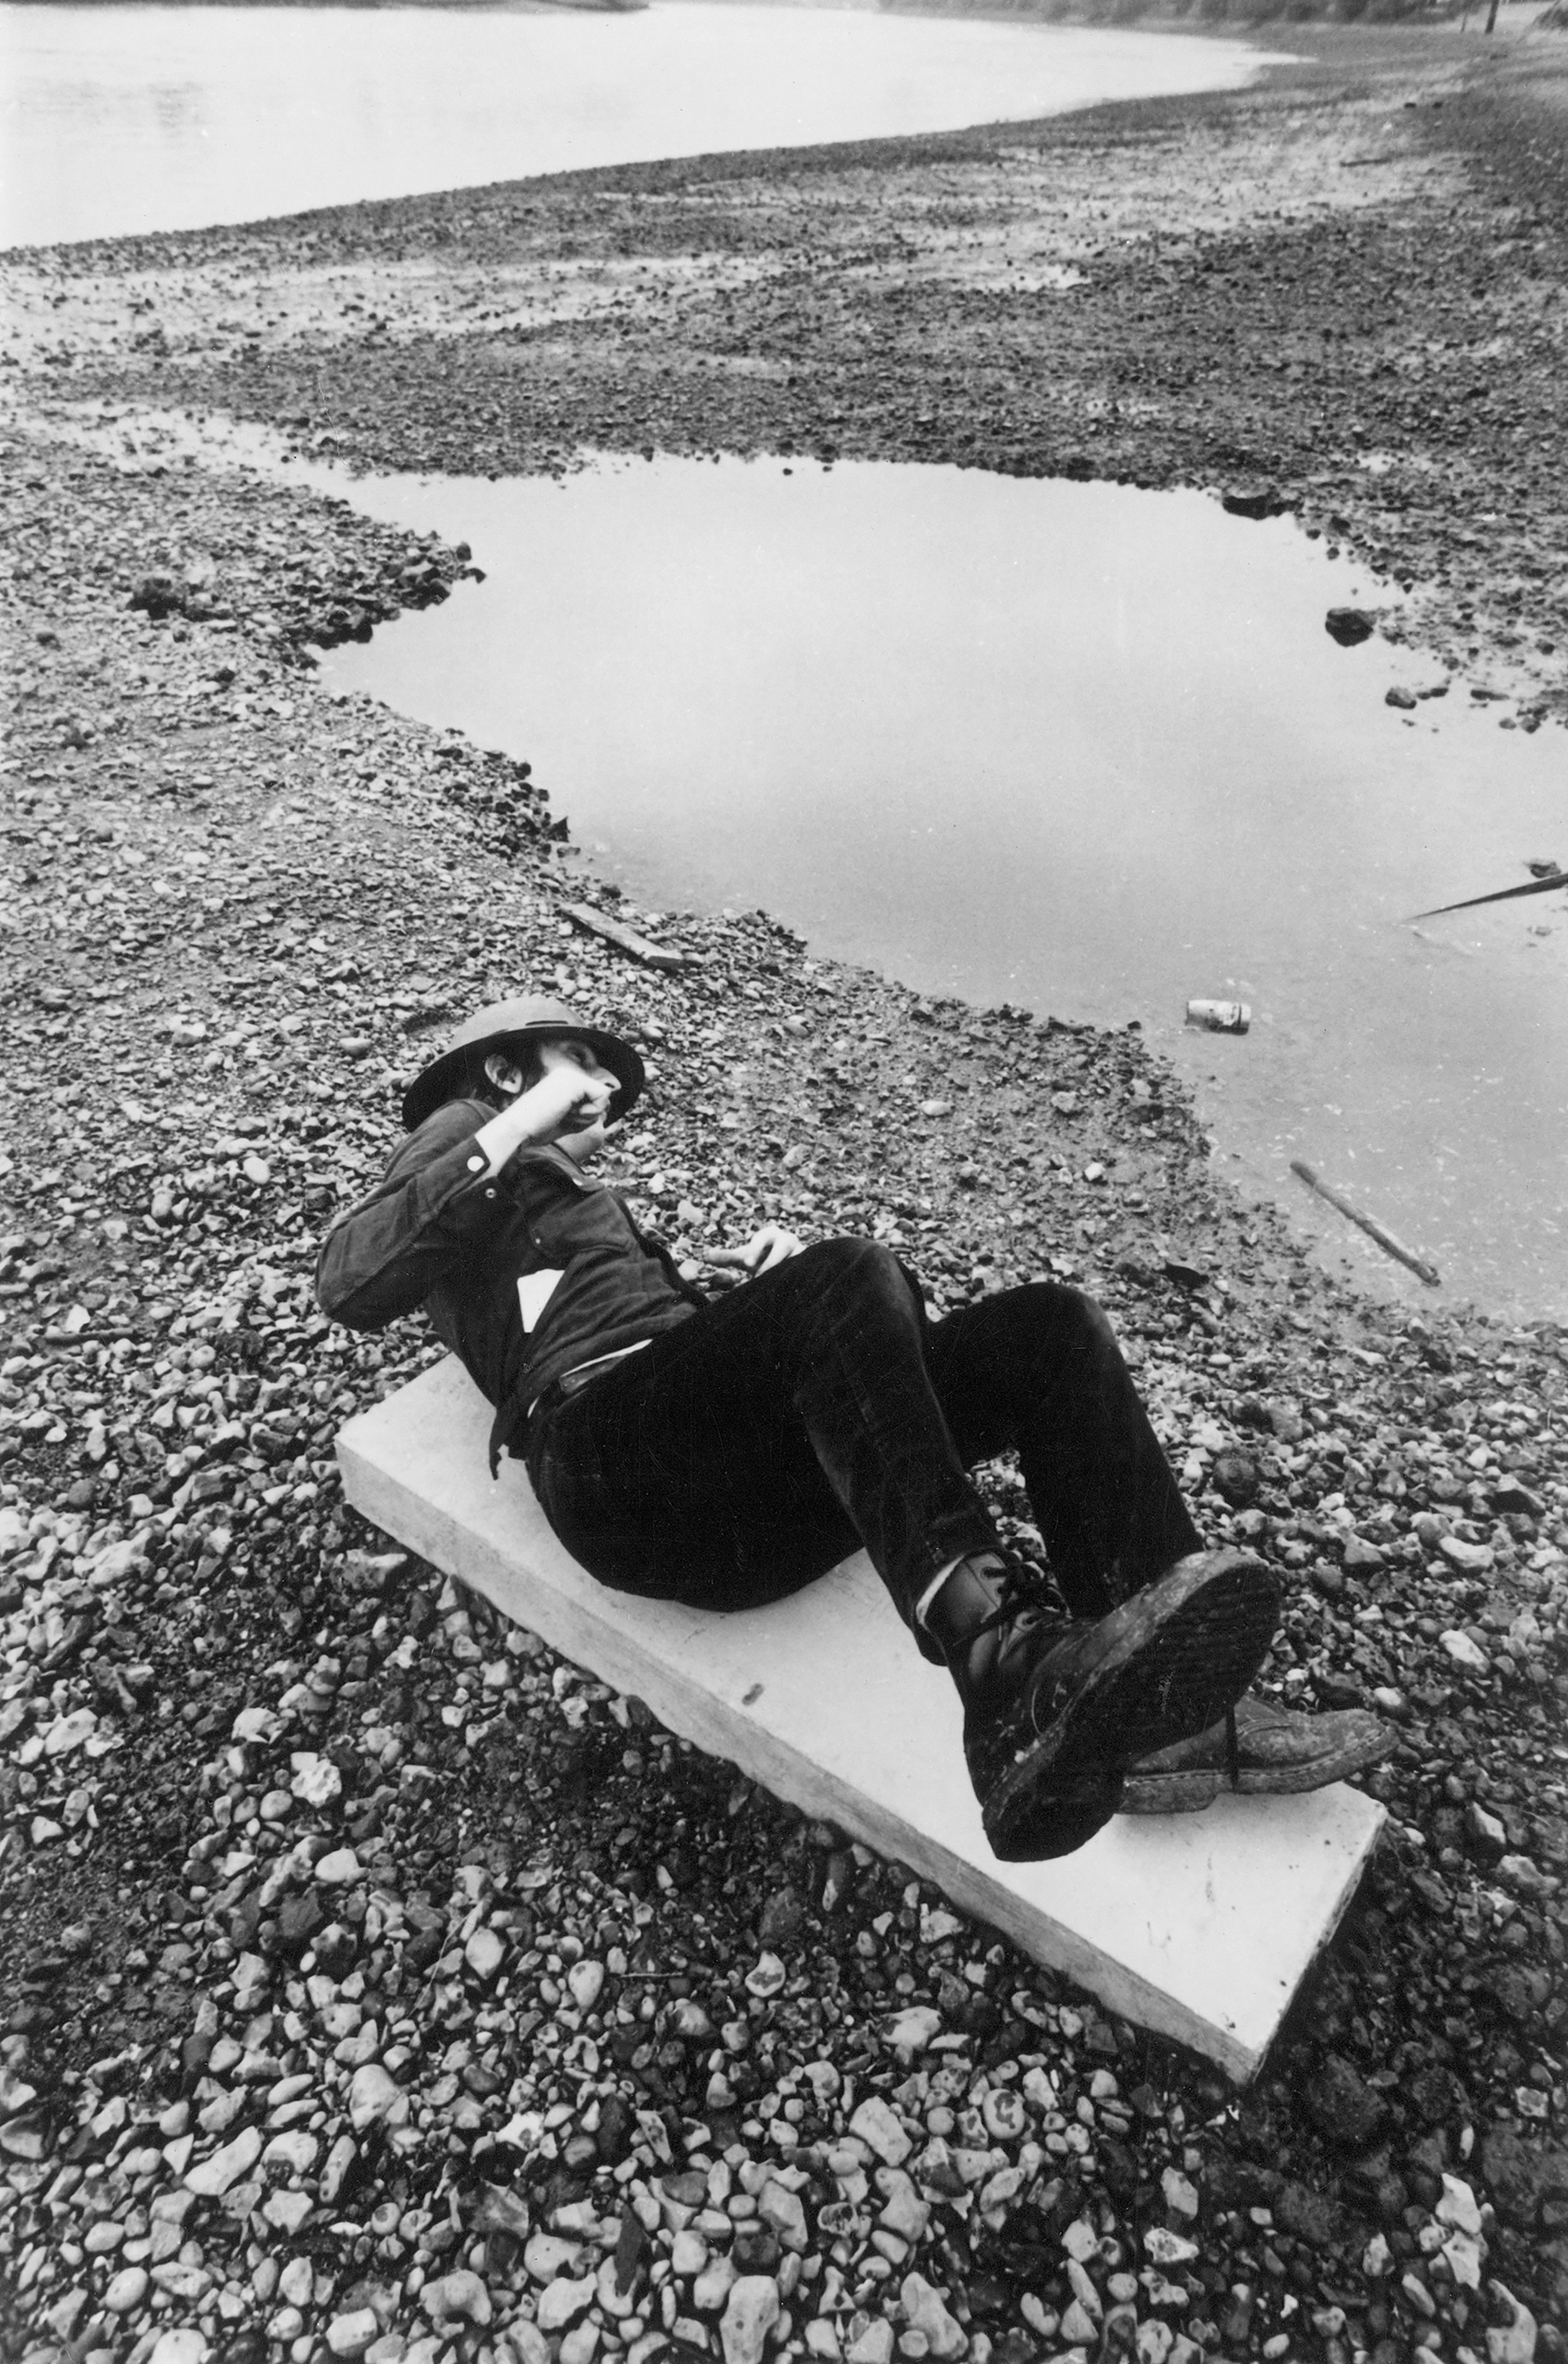 bruce mclean, fallen warrior (1969). Photo by Dirk buwalda